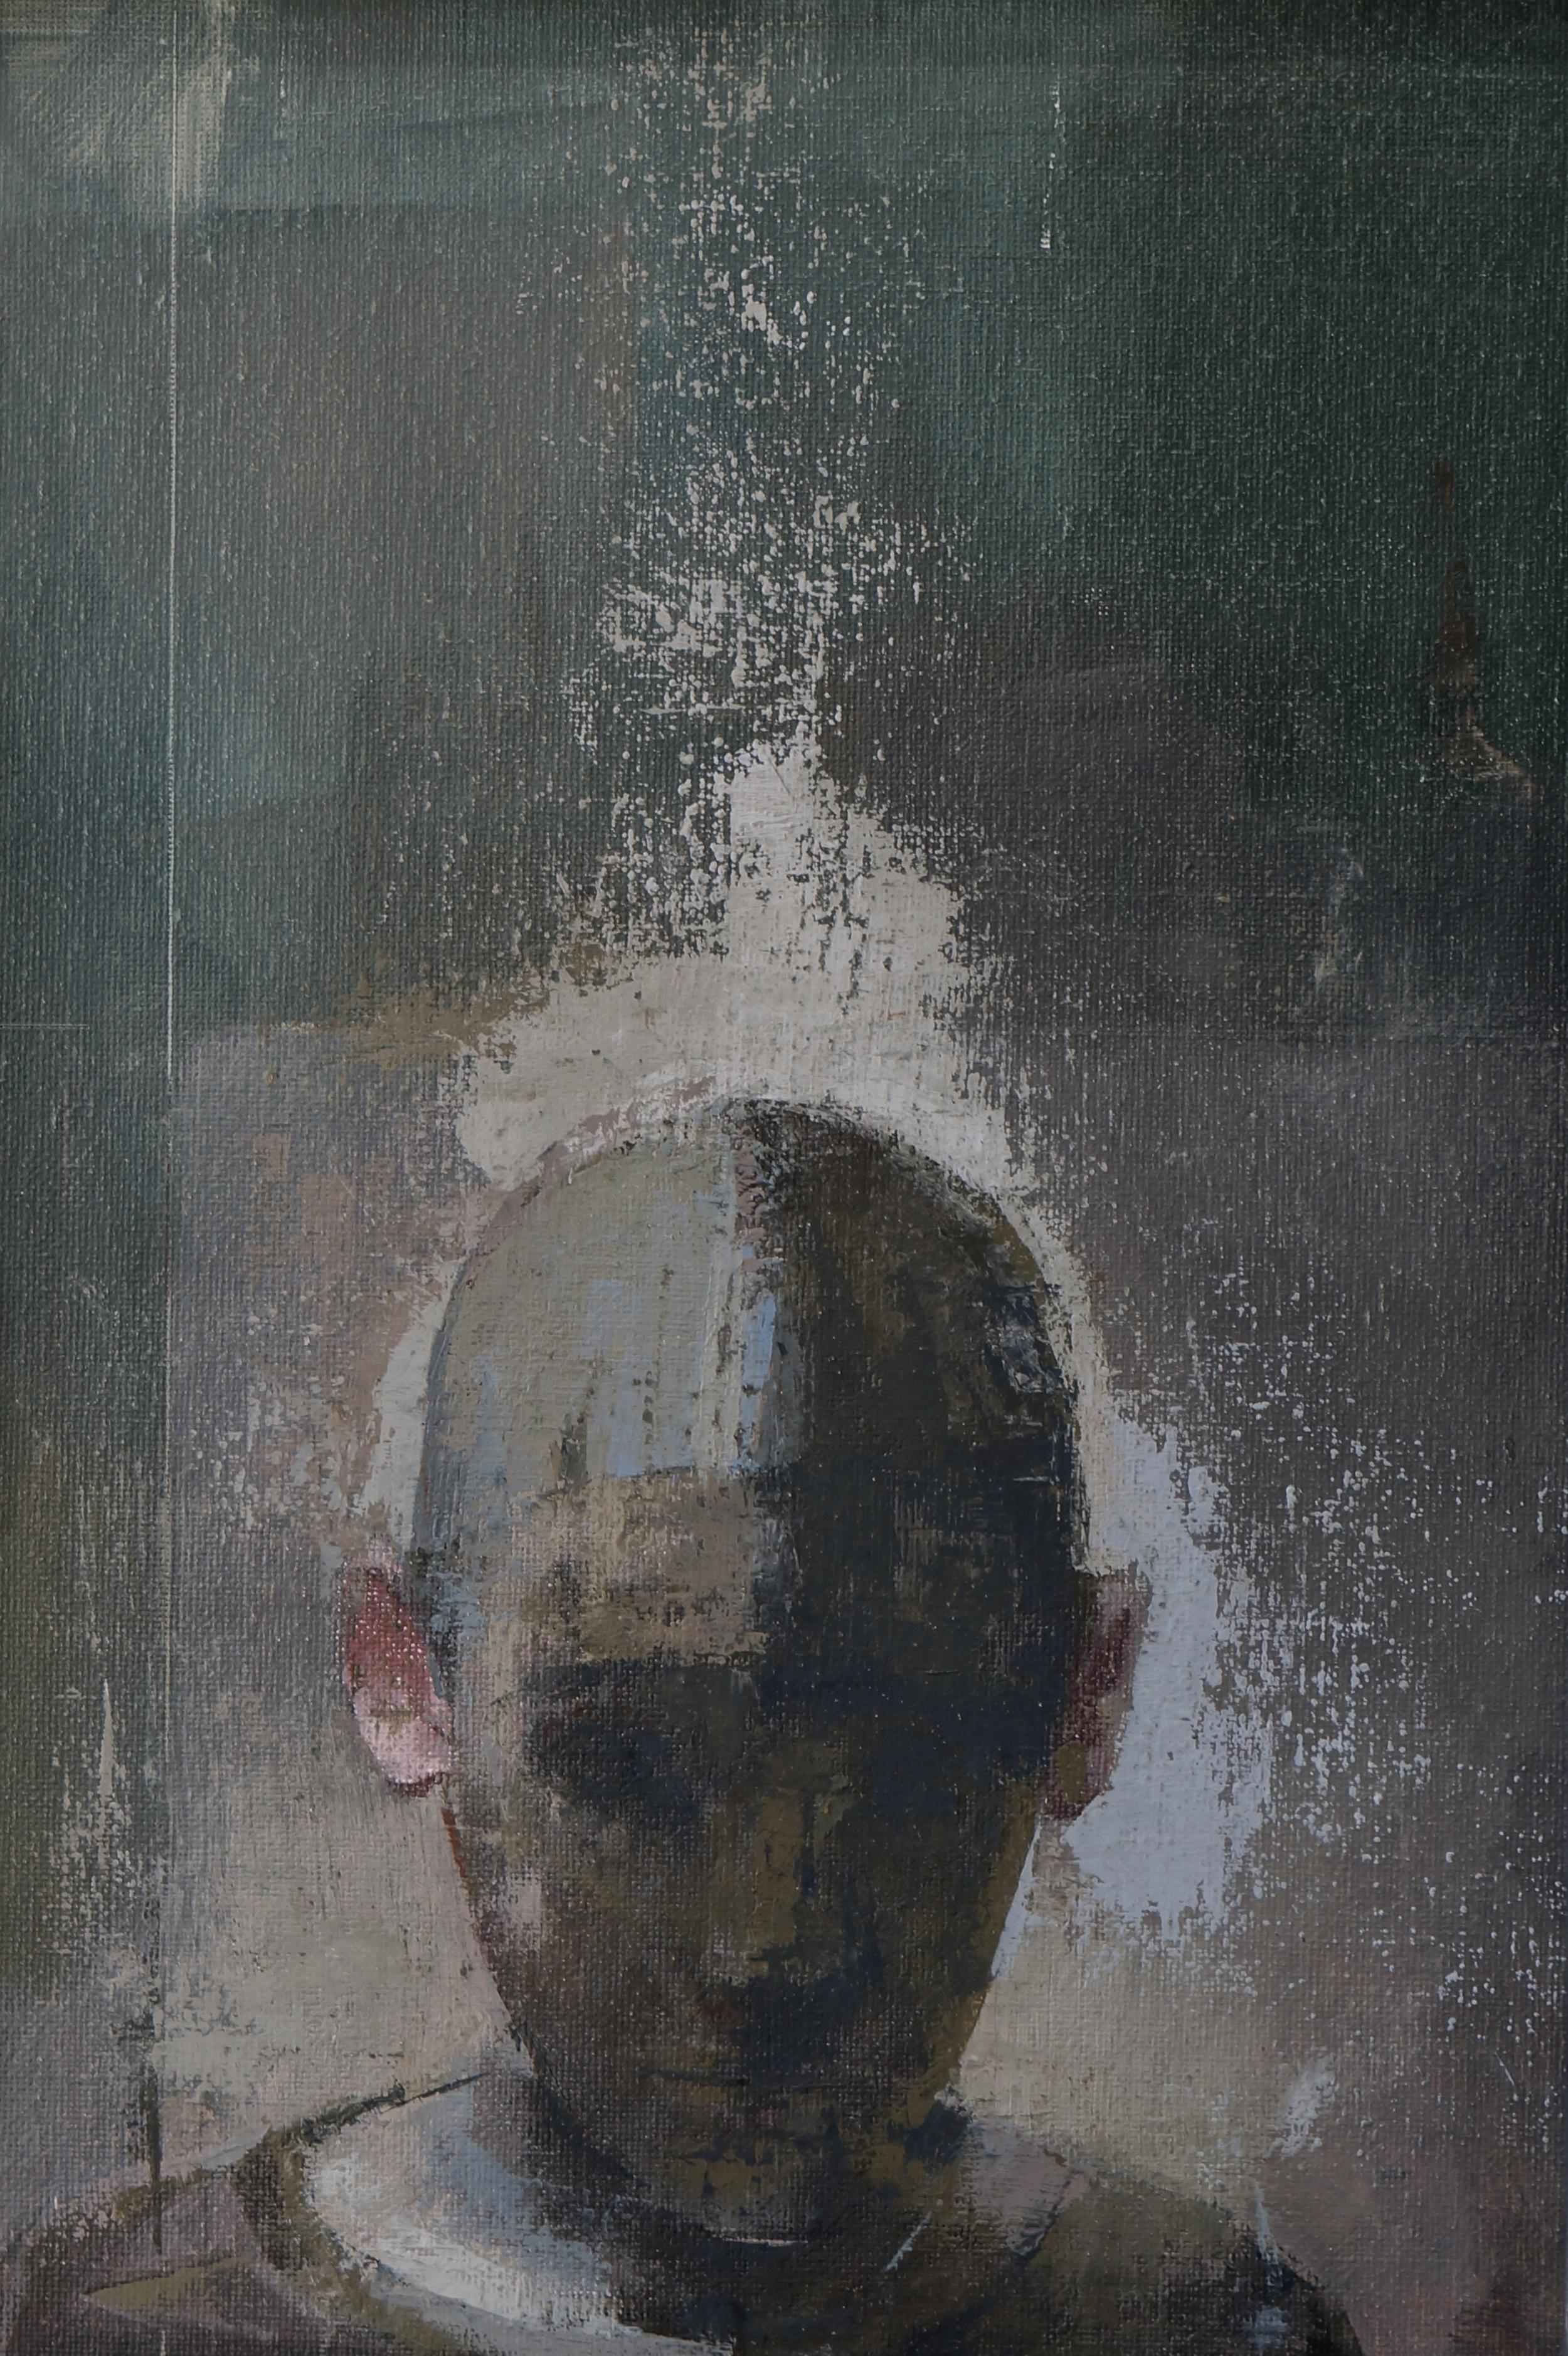 Steve in Shadow